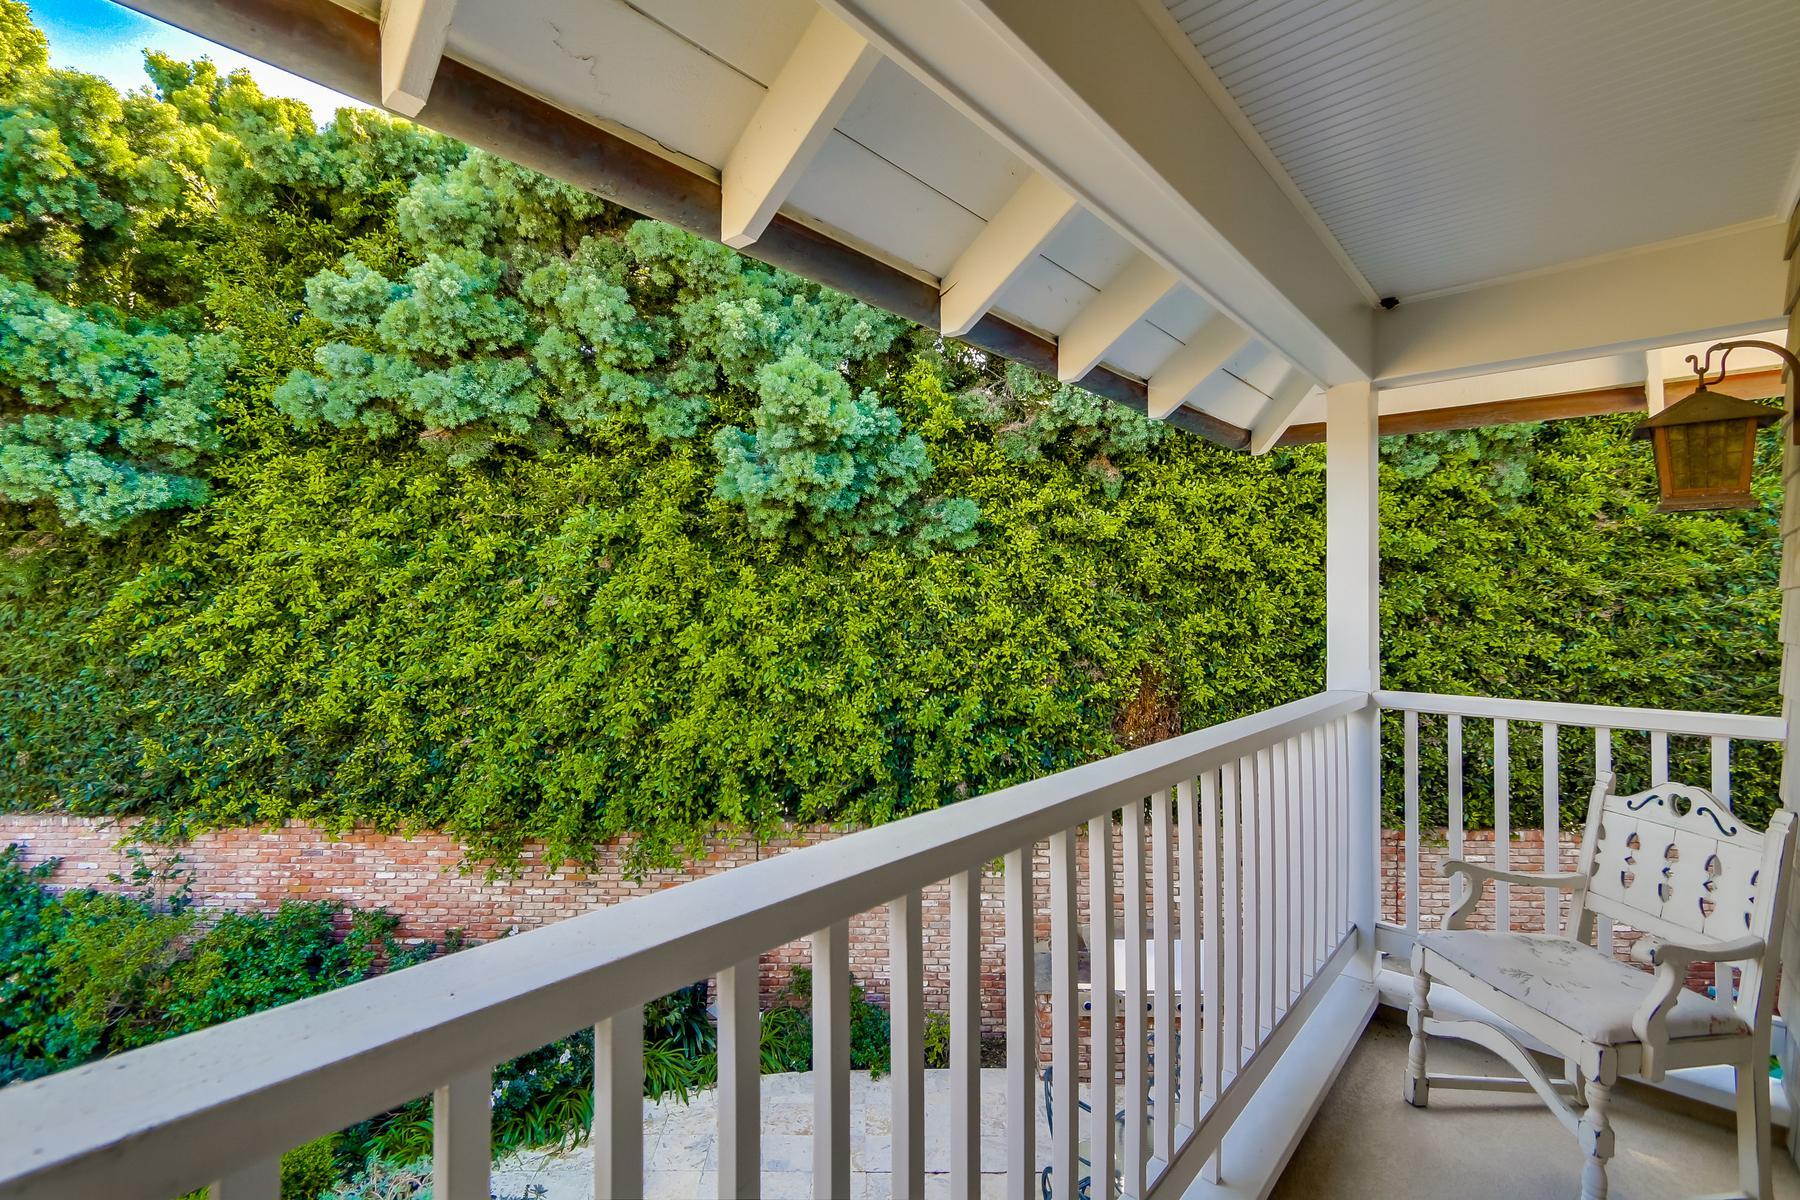 Additional photo for property listing at 1030 Loma Avenue  Coronado, California 92118 United States